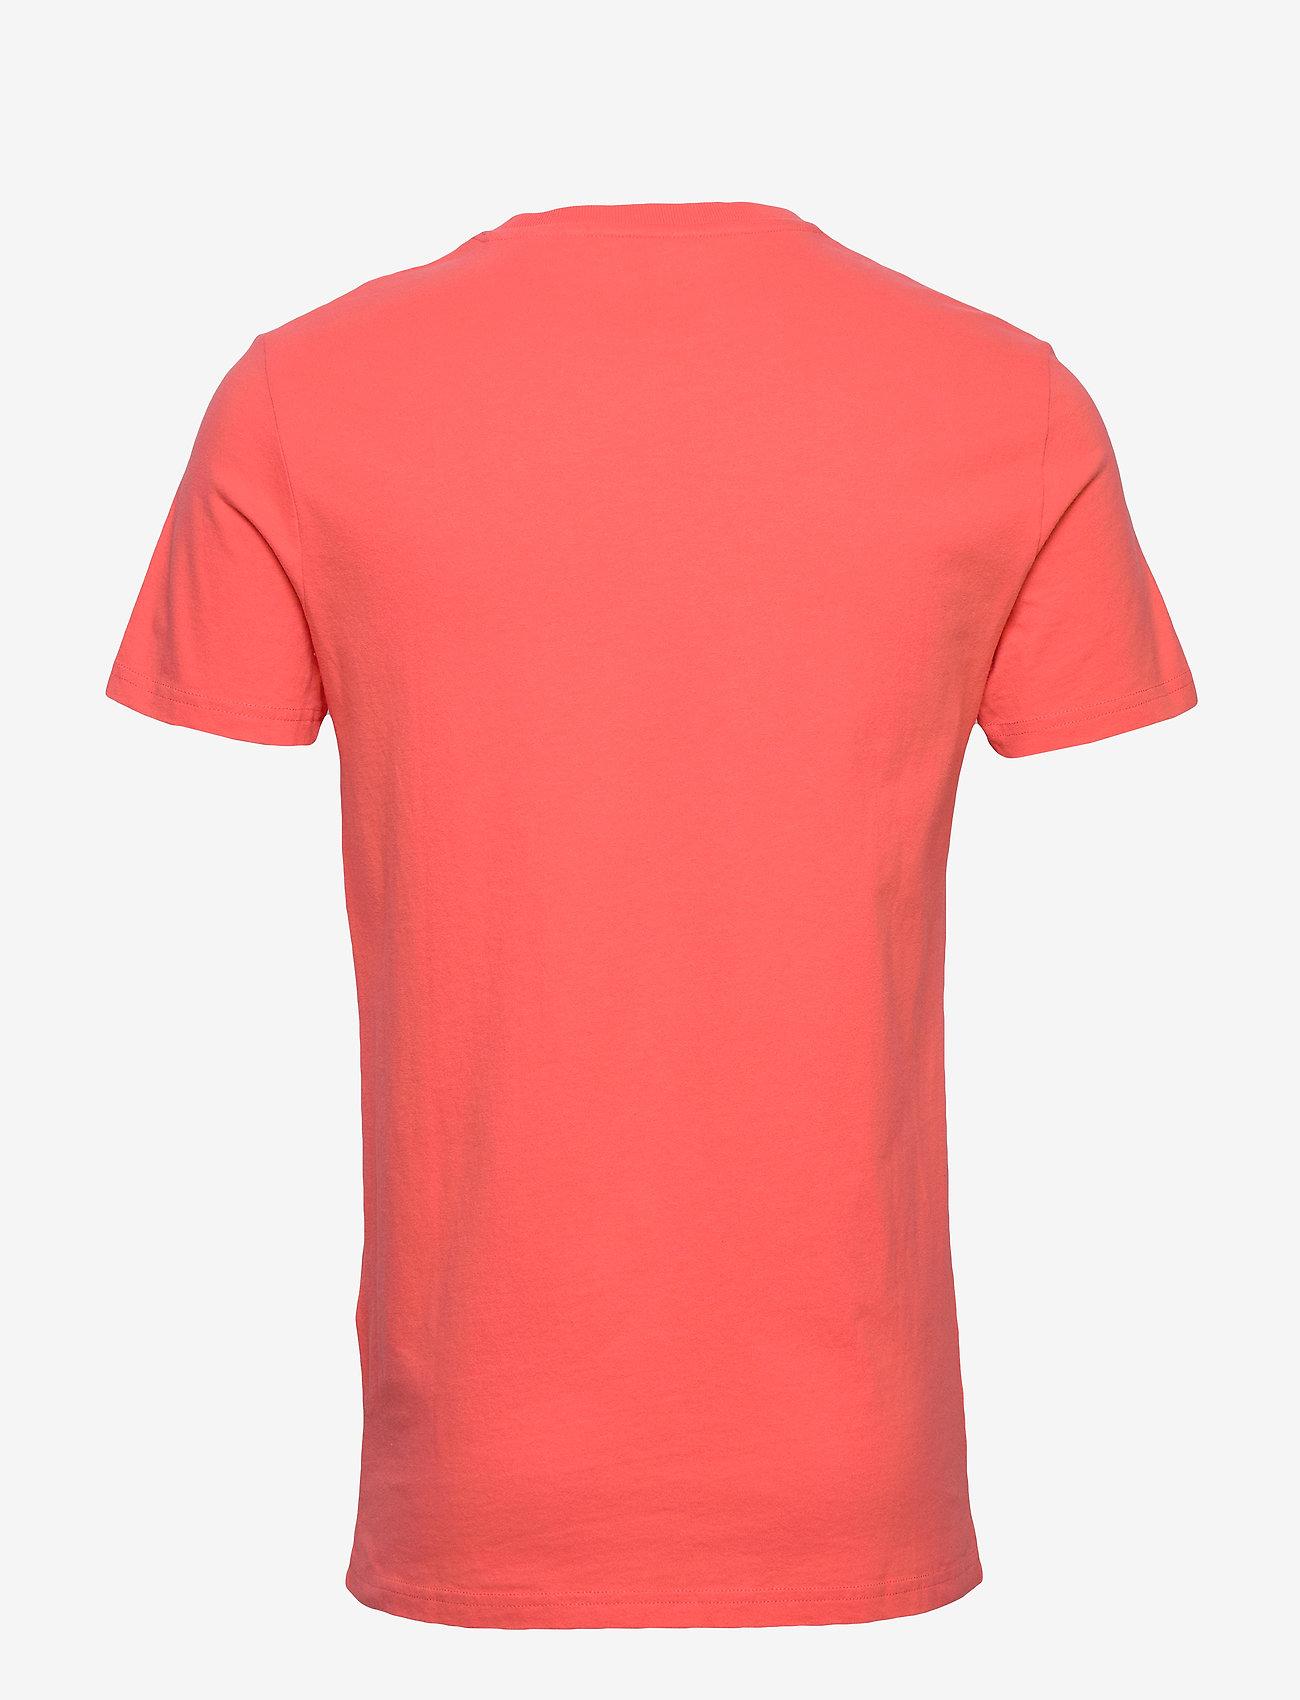 Superdry VL O TEE - T-skjorter MALDIVE PINK - Menn Klær